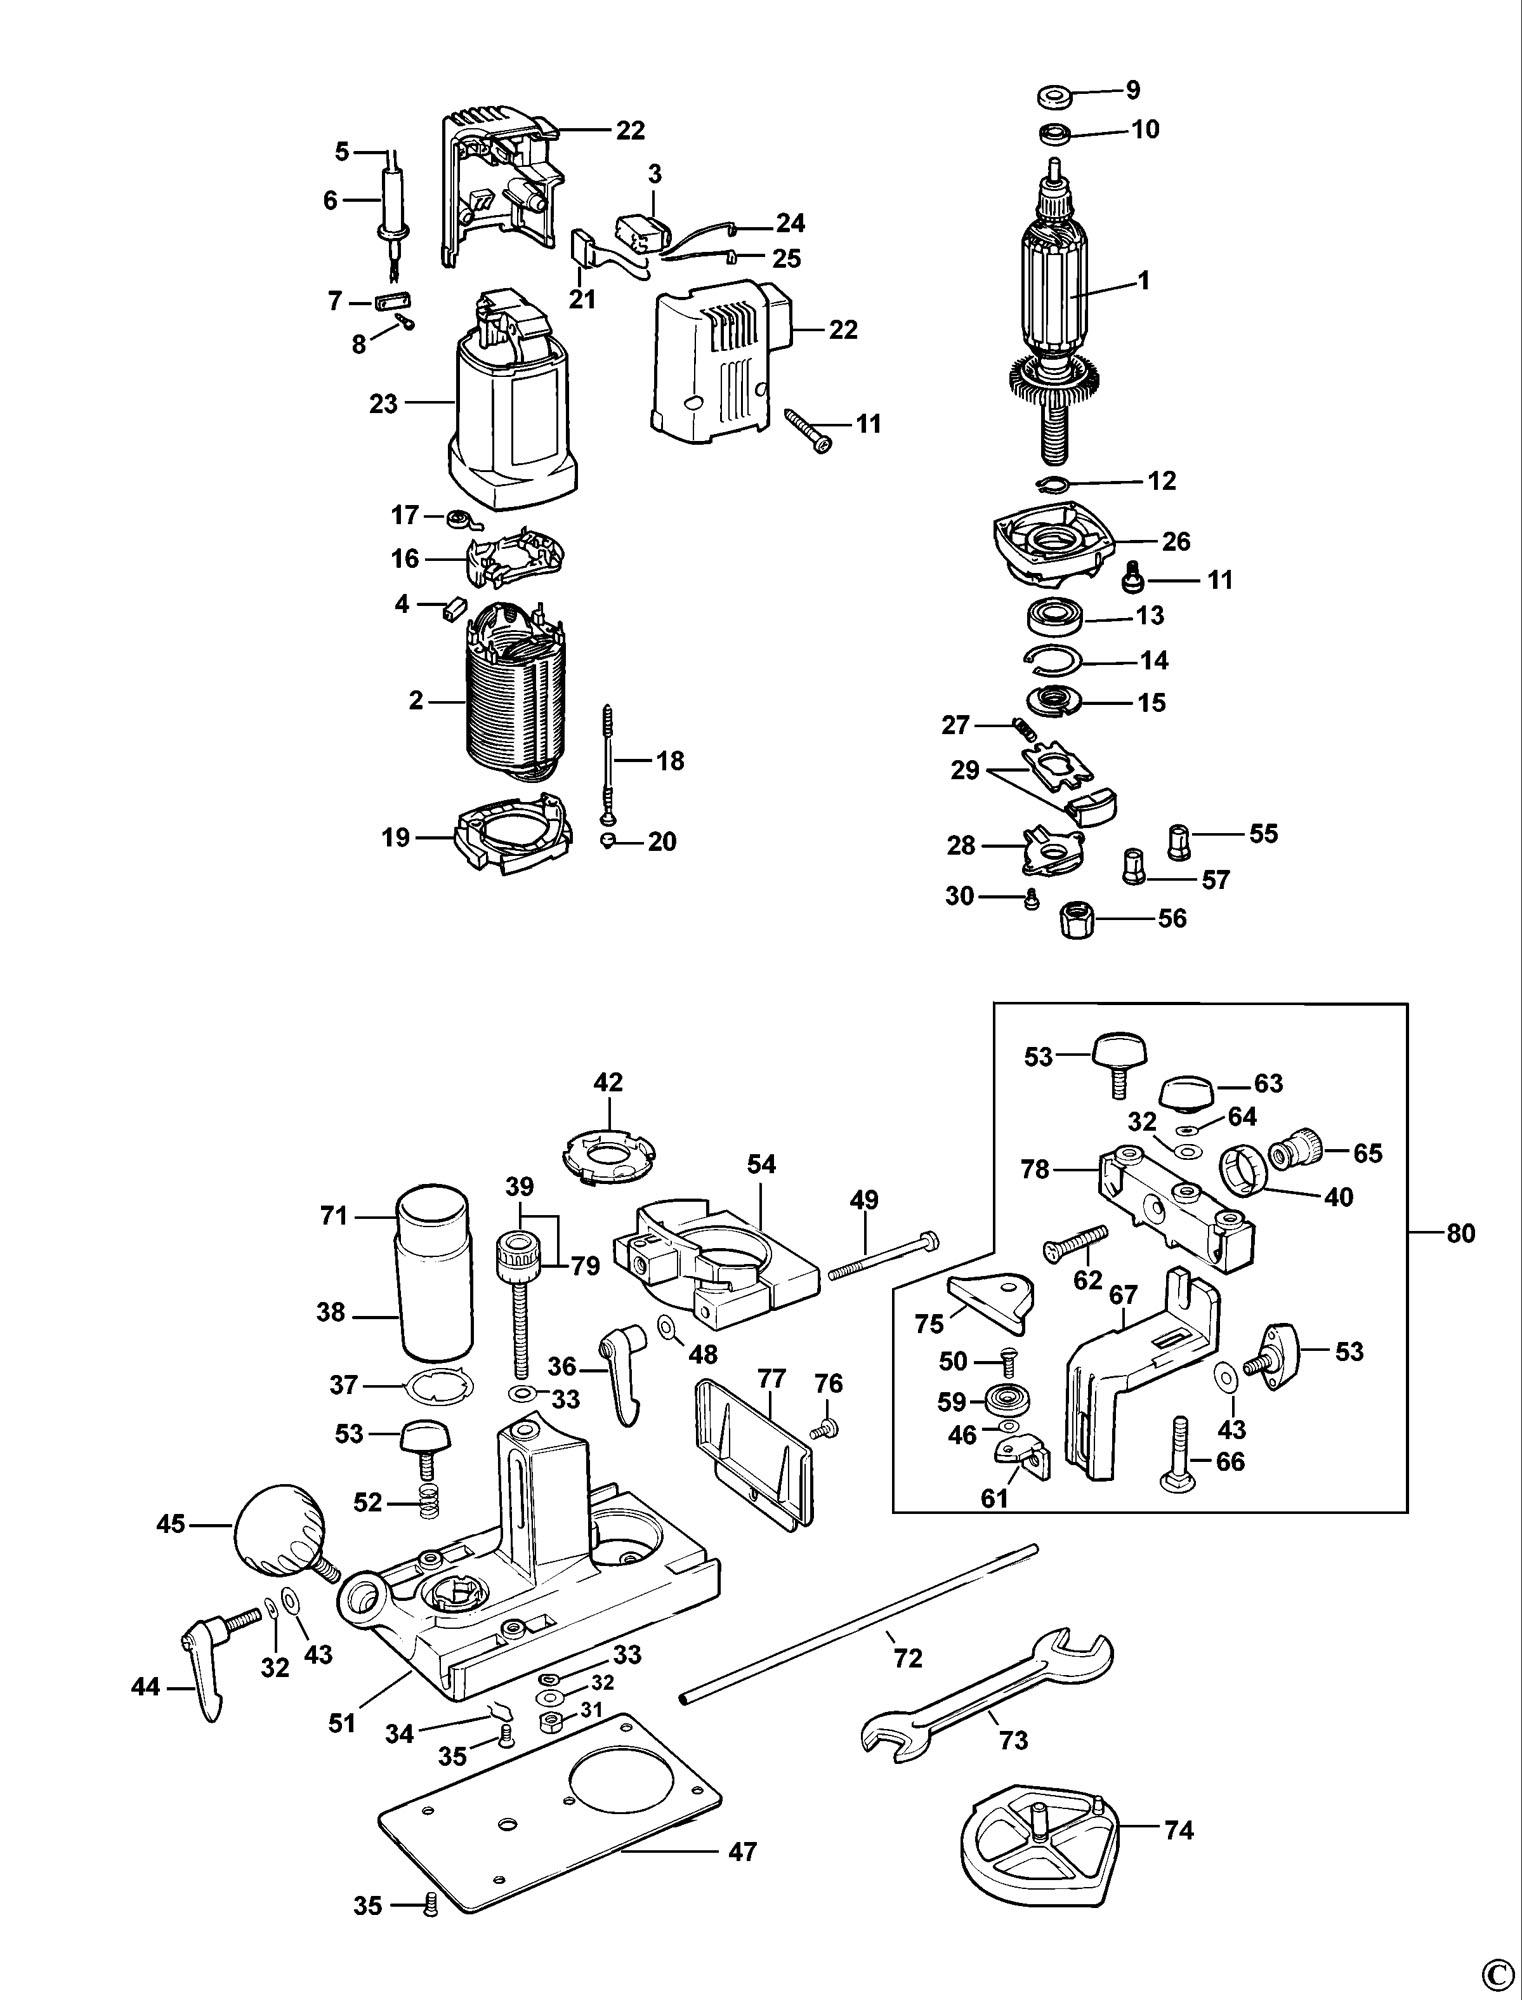 Spares For Dewalt Dw631 Laminate Trimmer Type 1 Spare